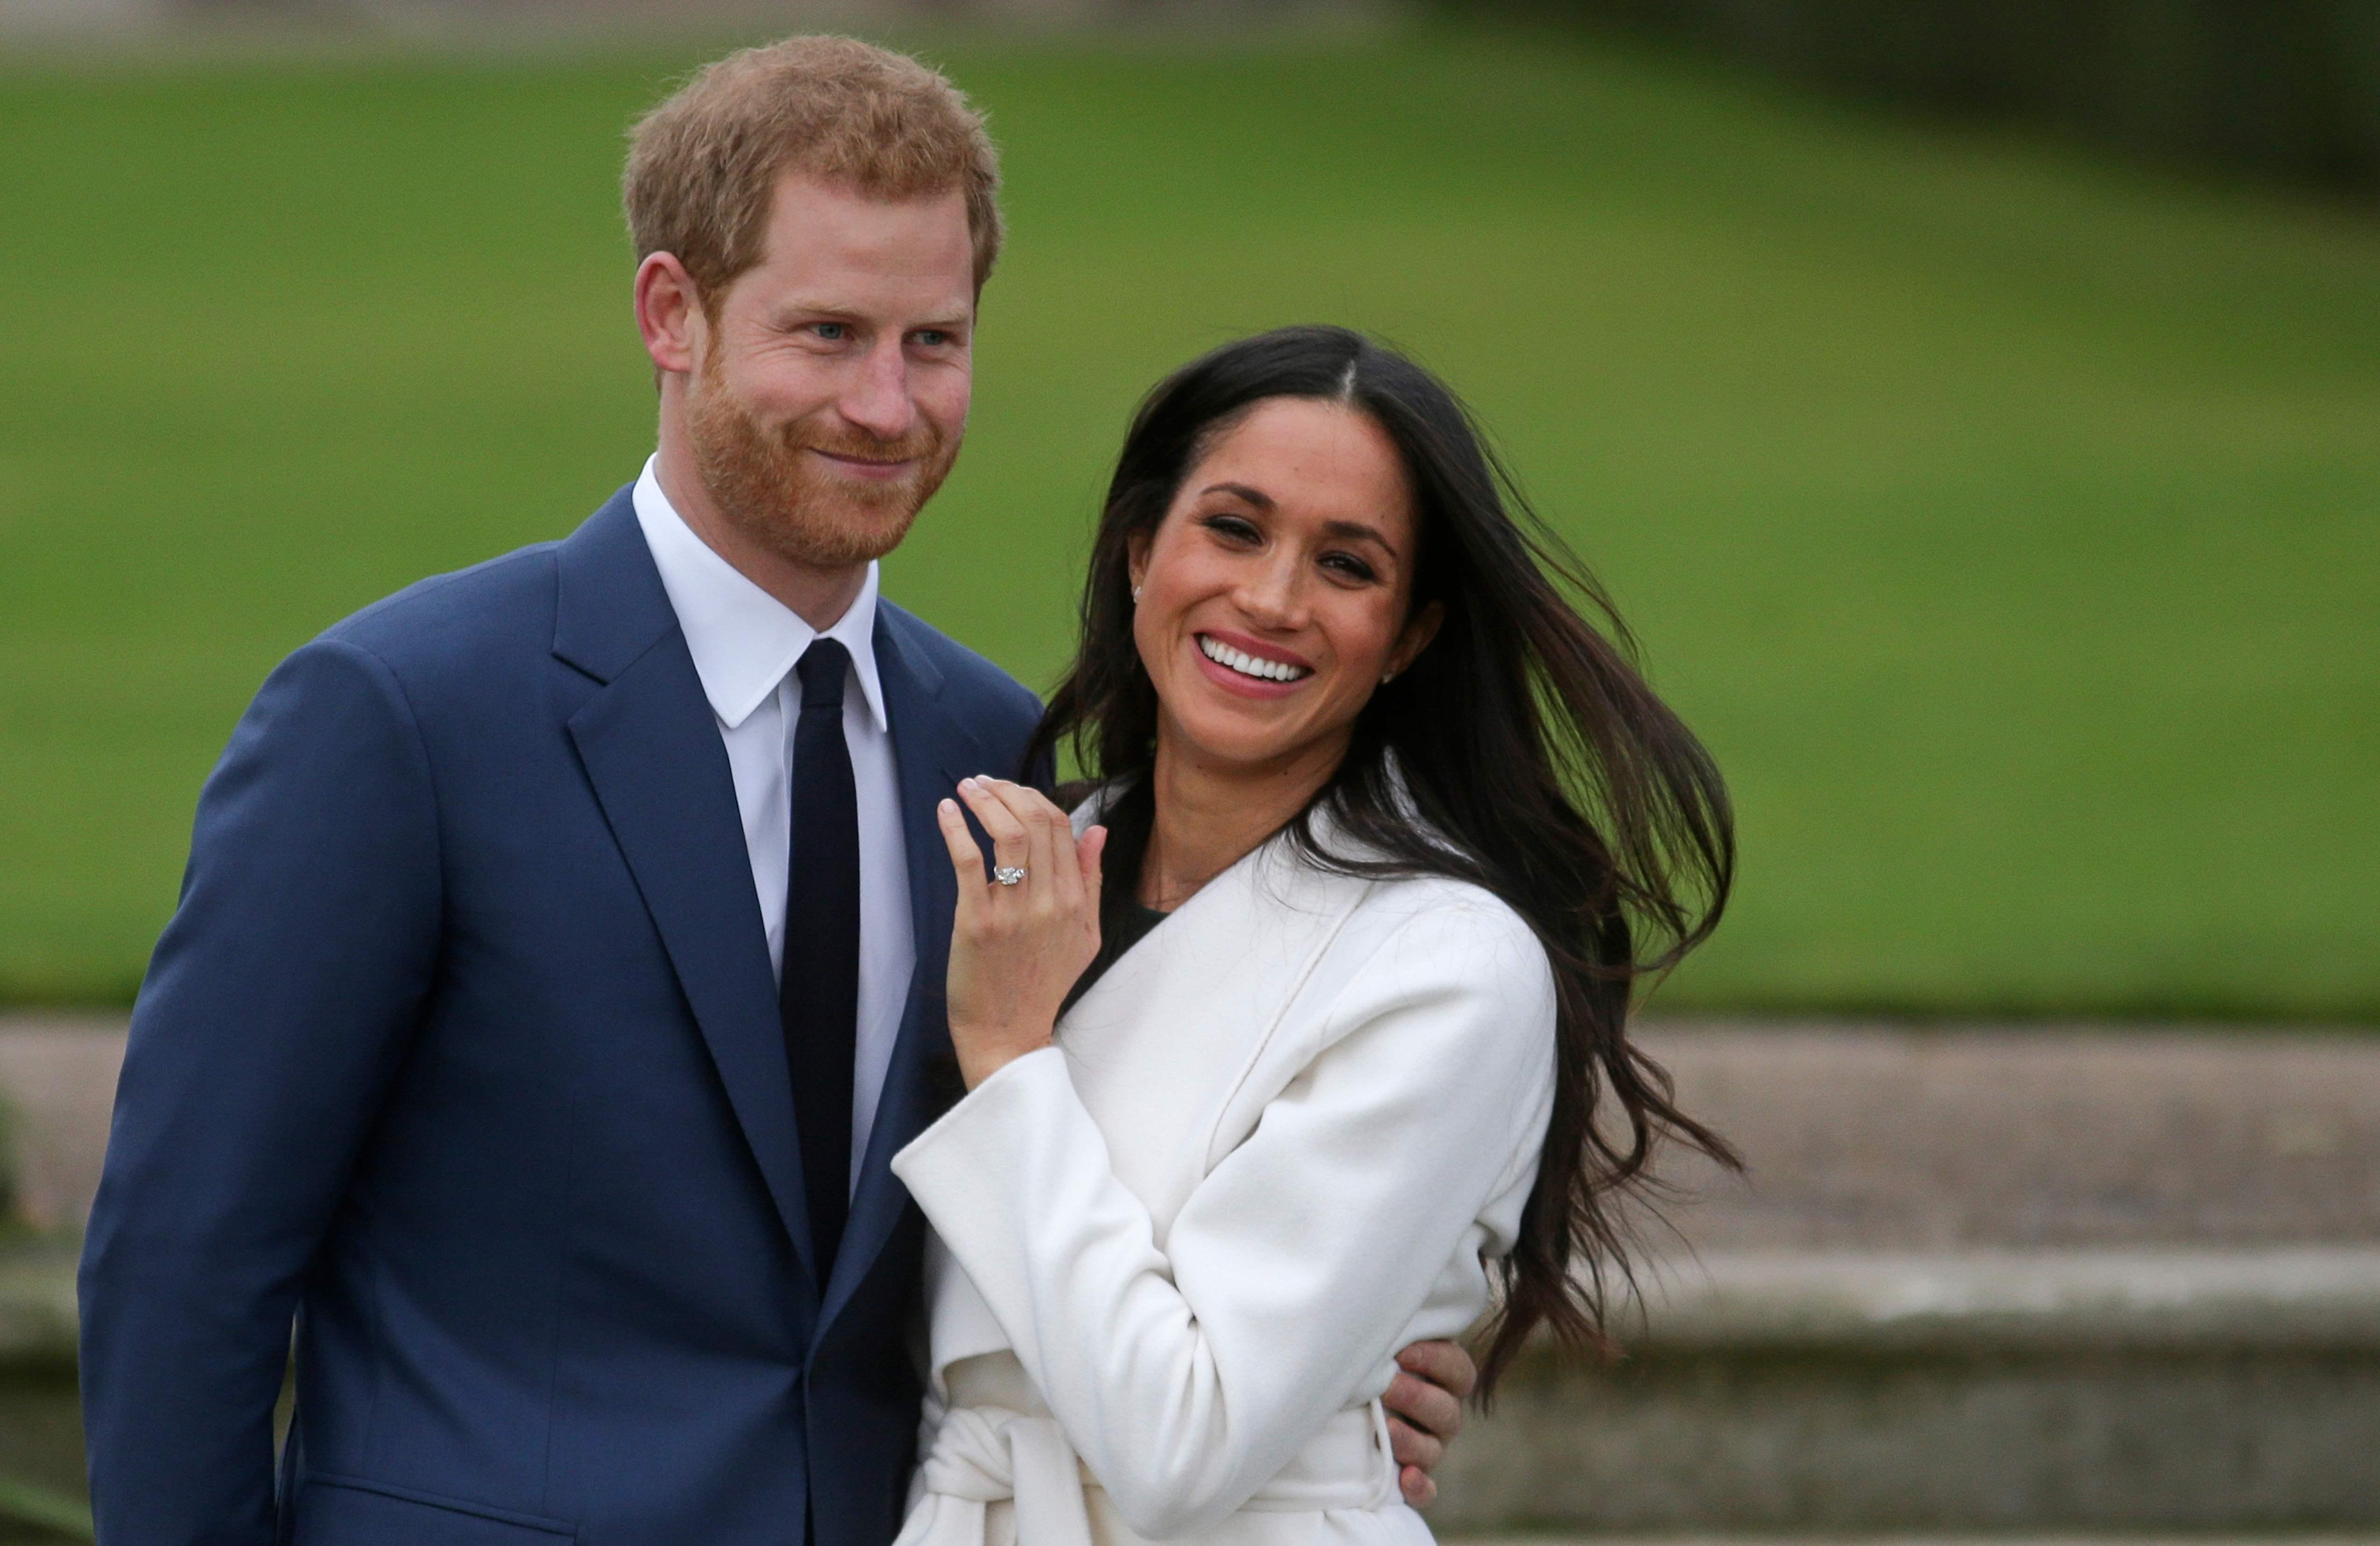 Príncipe Harry vai se casar com Meghan Markle